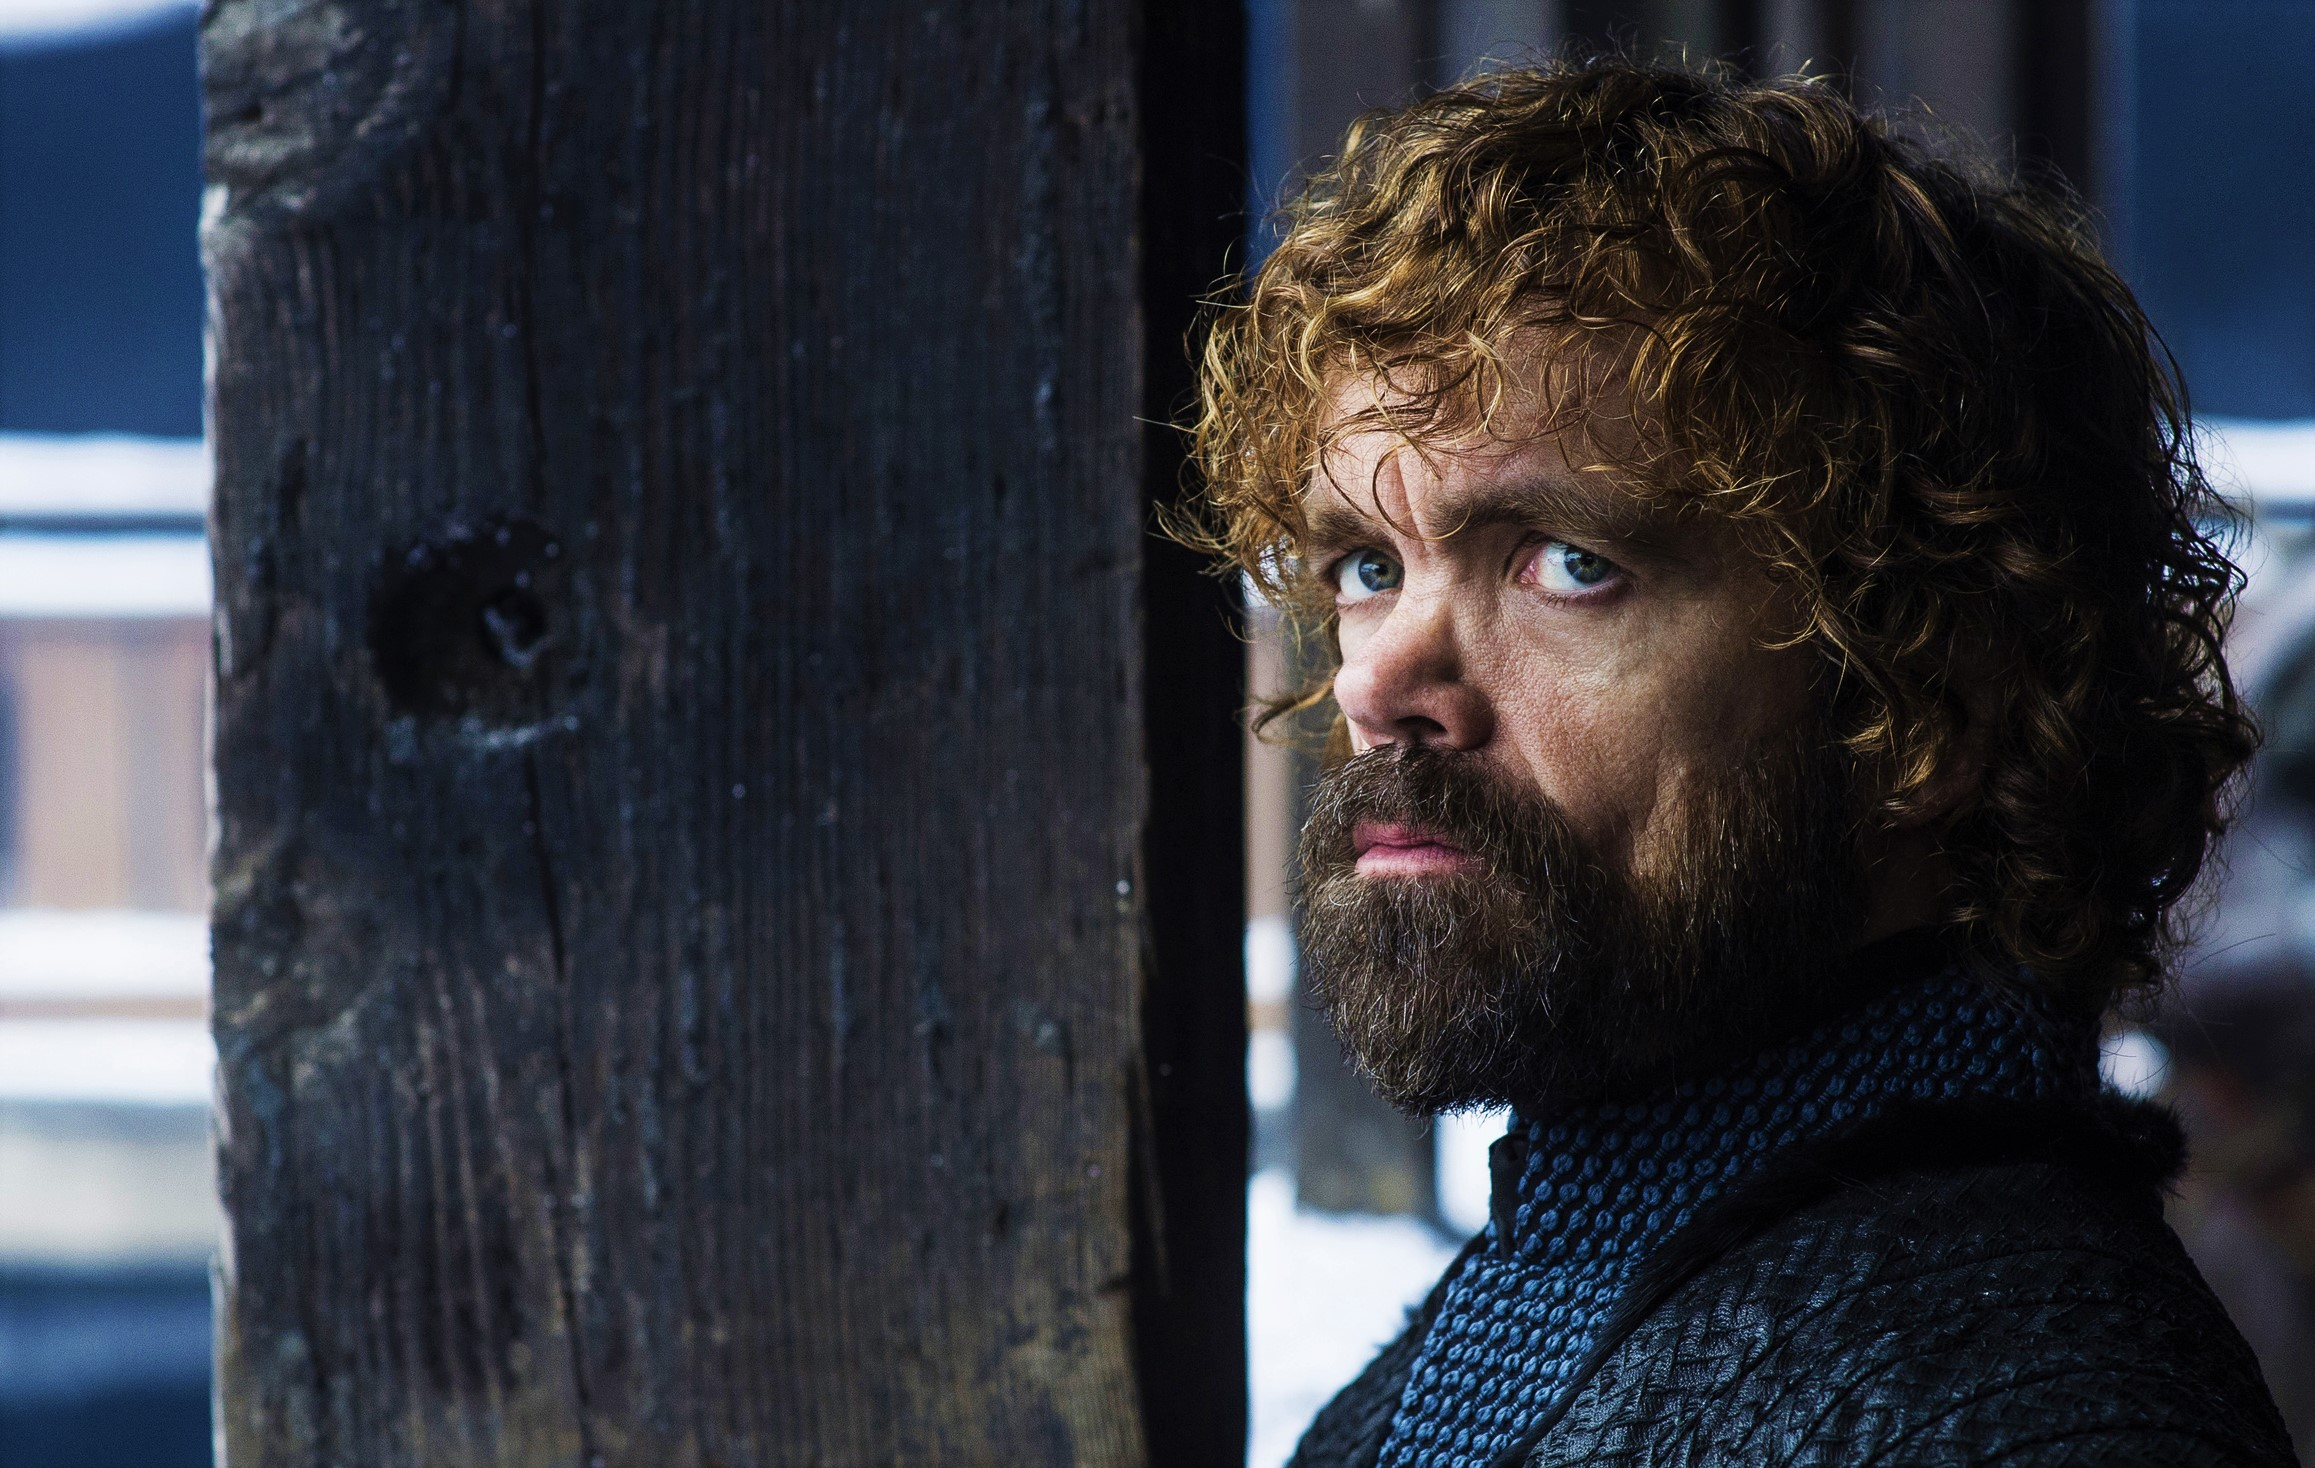 Tyrion Lannister, Winterfell, Season 8